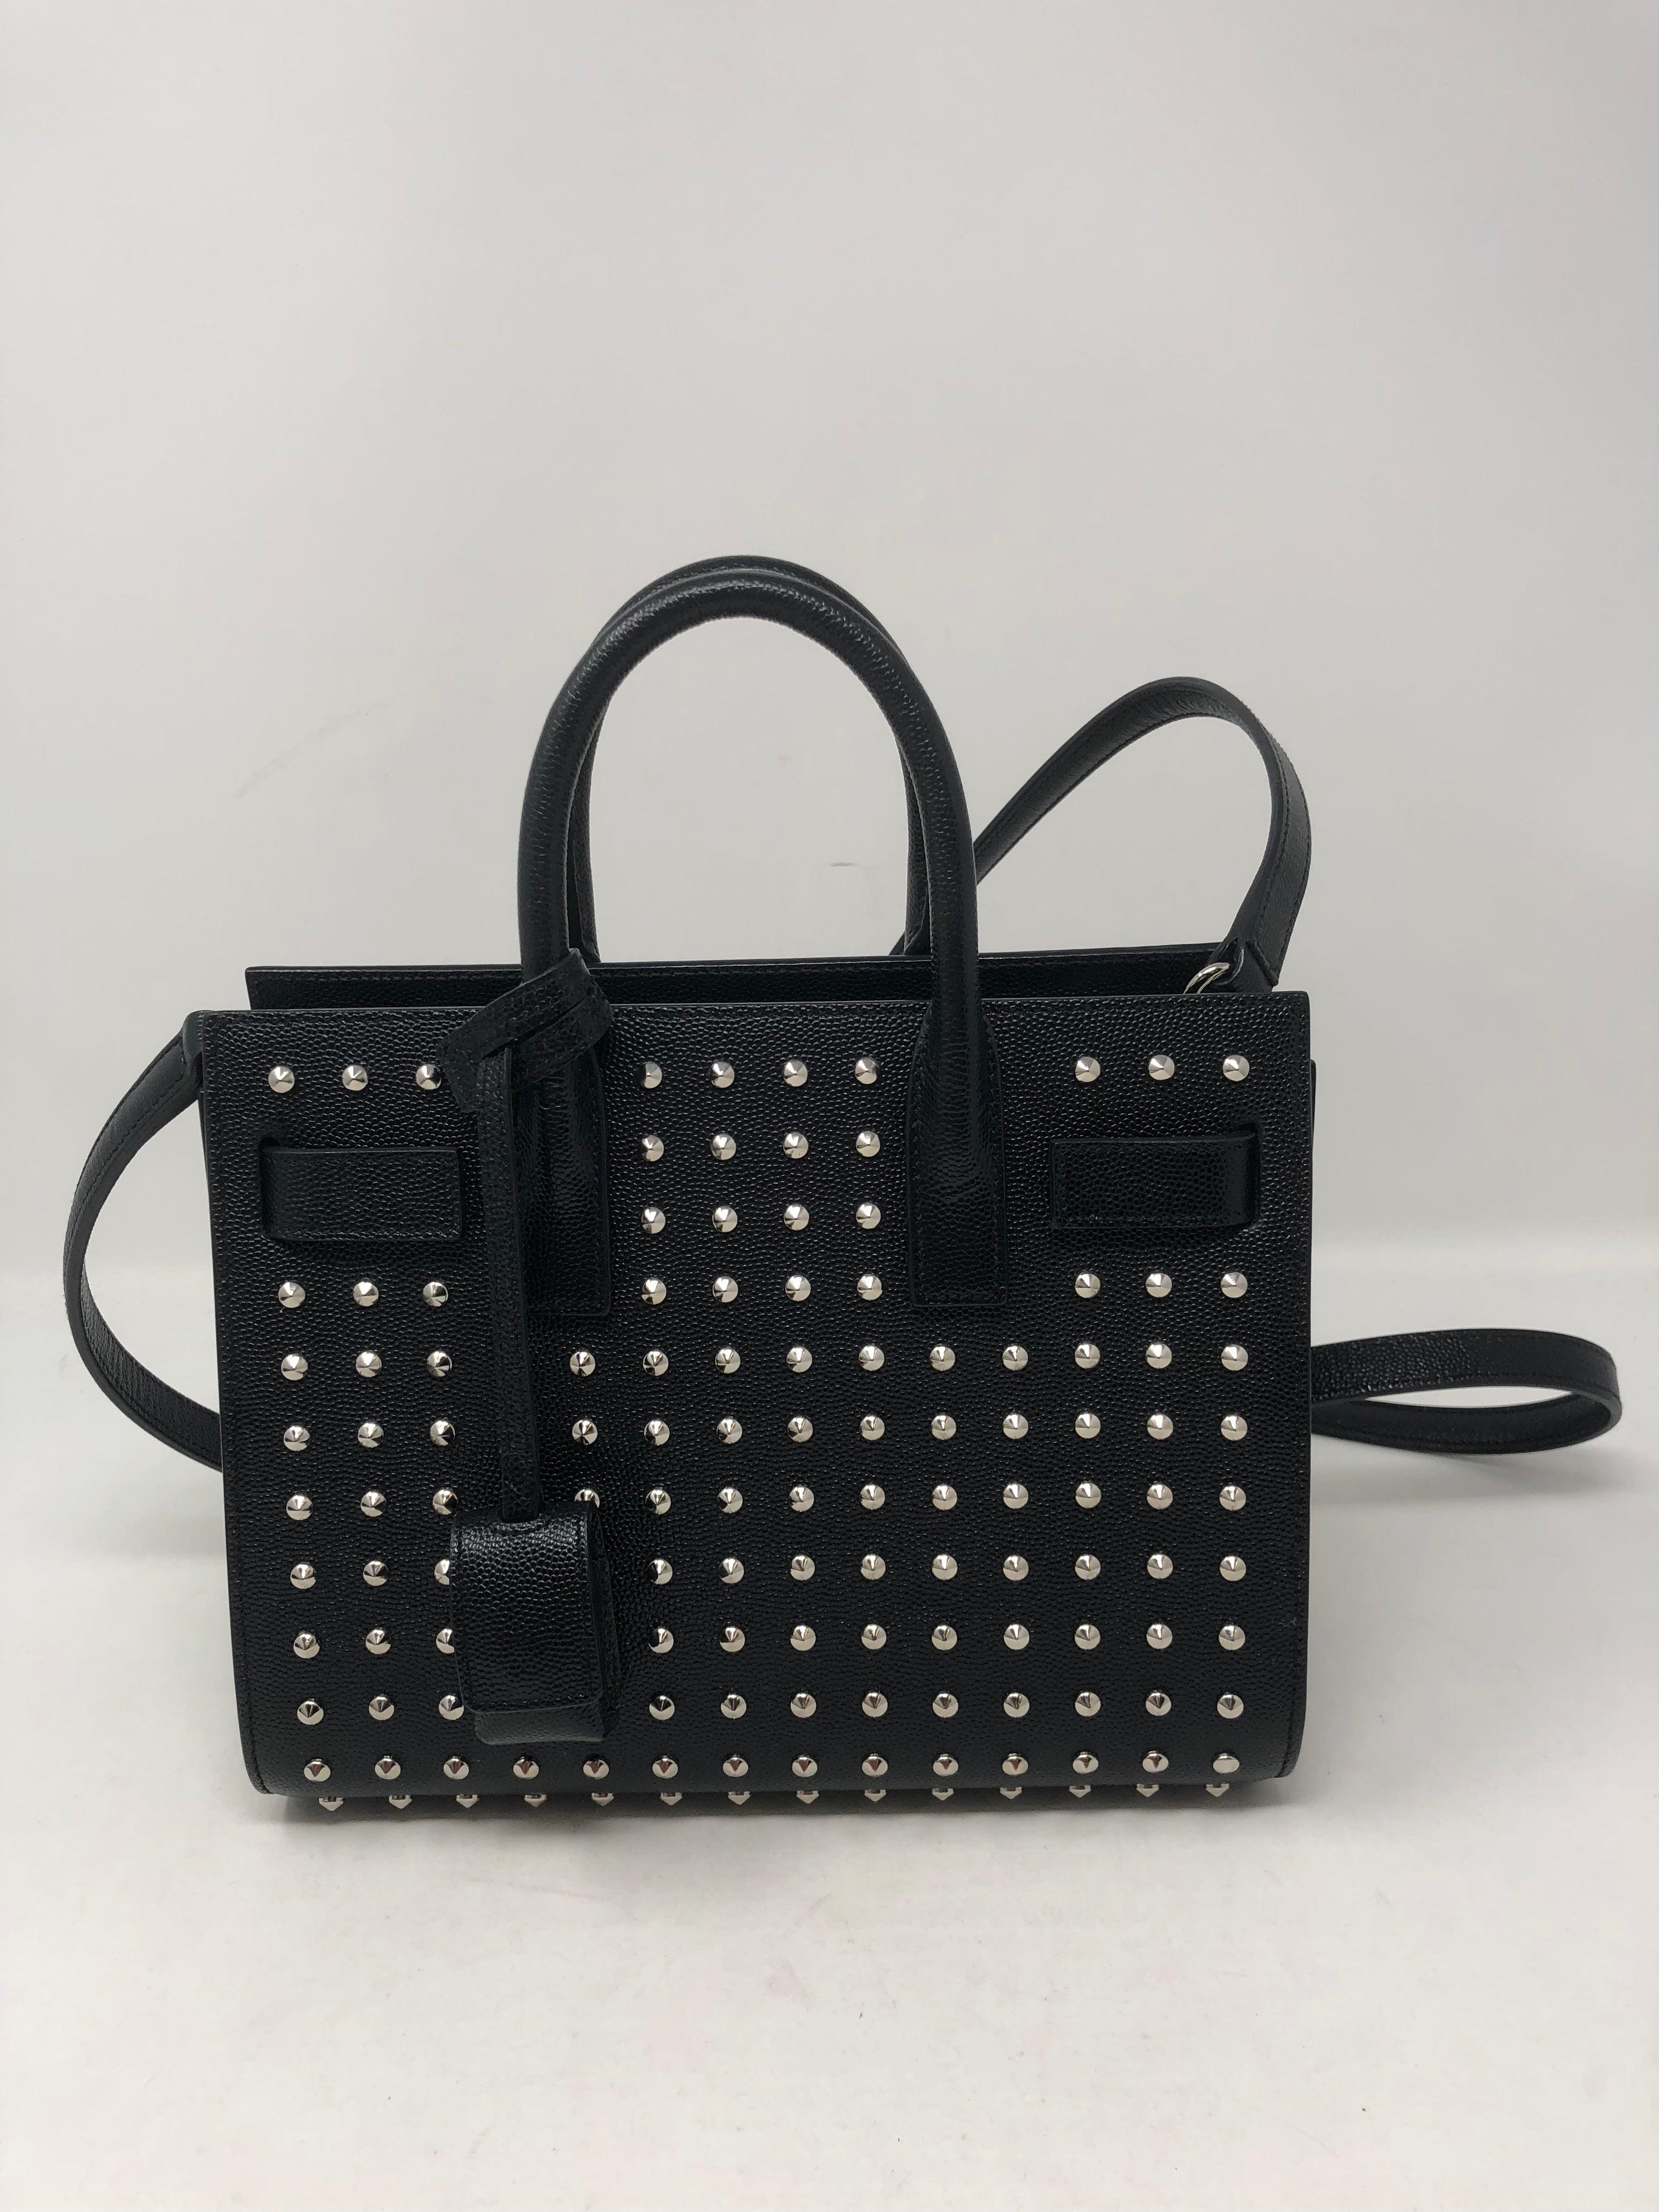 7b7cc26baf Yves Saint Laurent Black Studded Nano Sac Du Jour Bag For Sale at 1stdibs